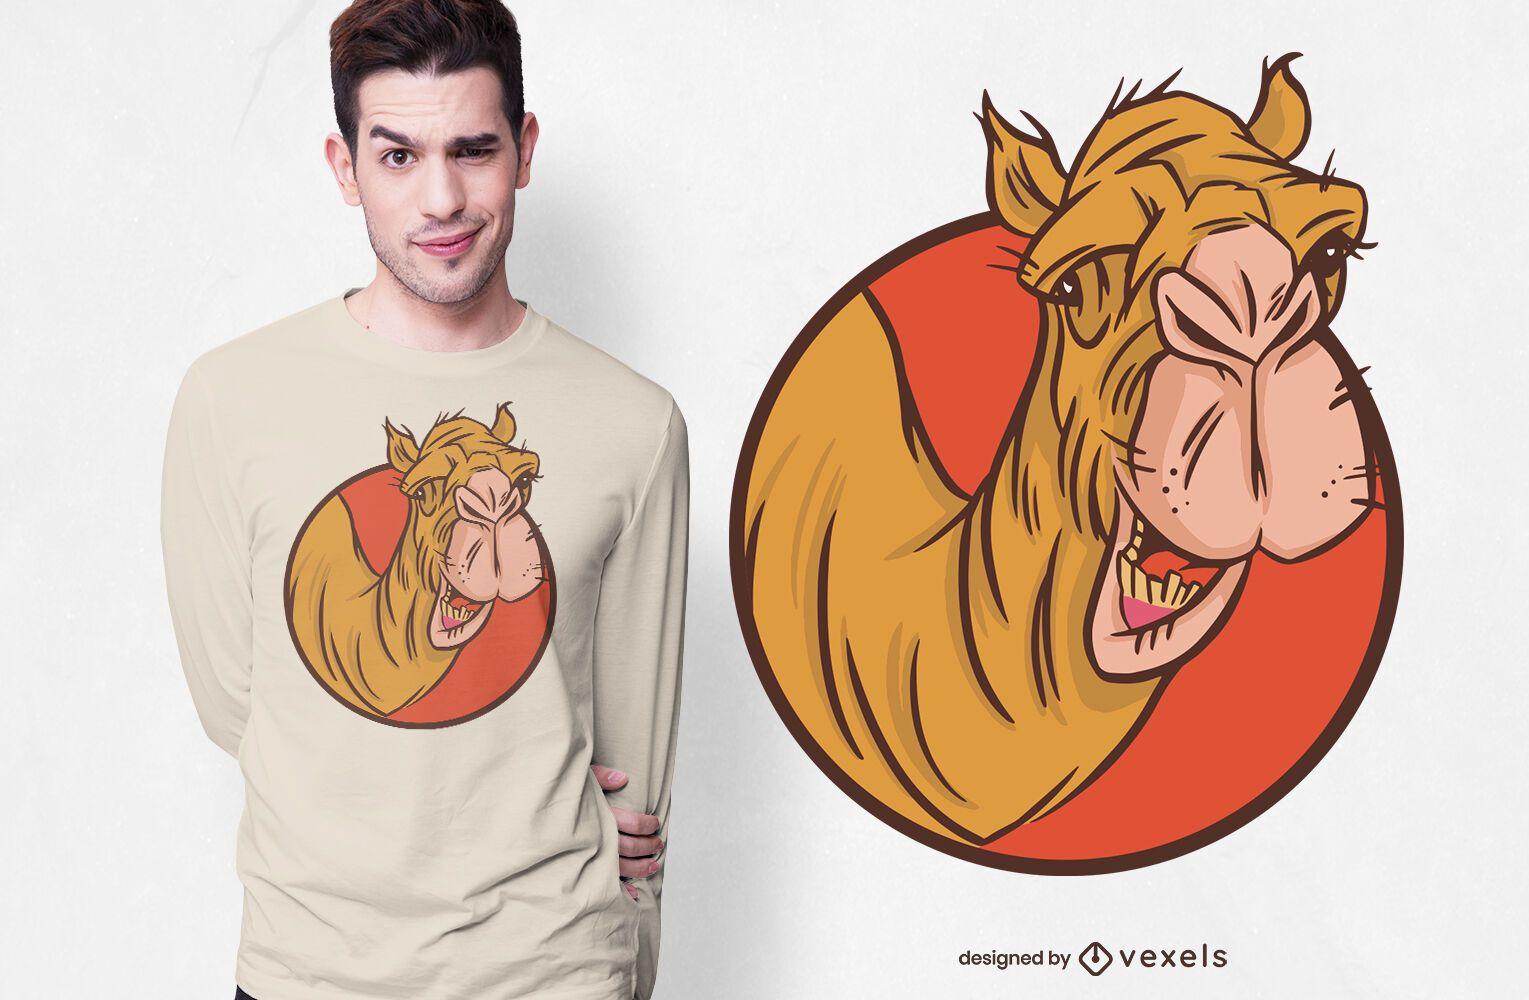 Camel face t-shirt design